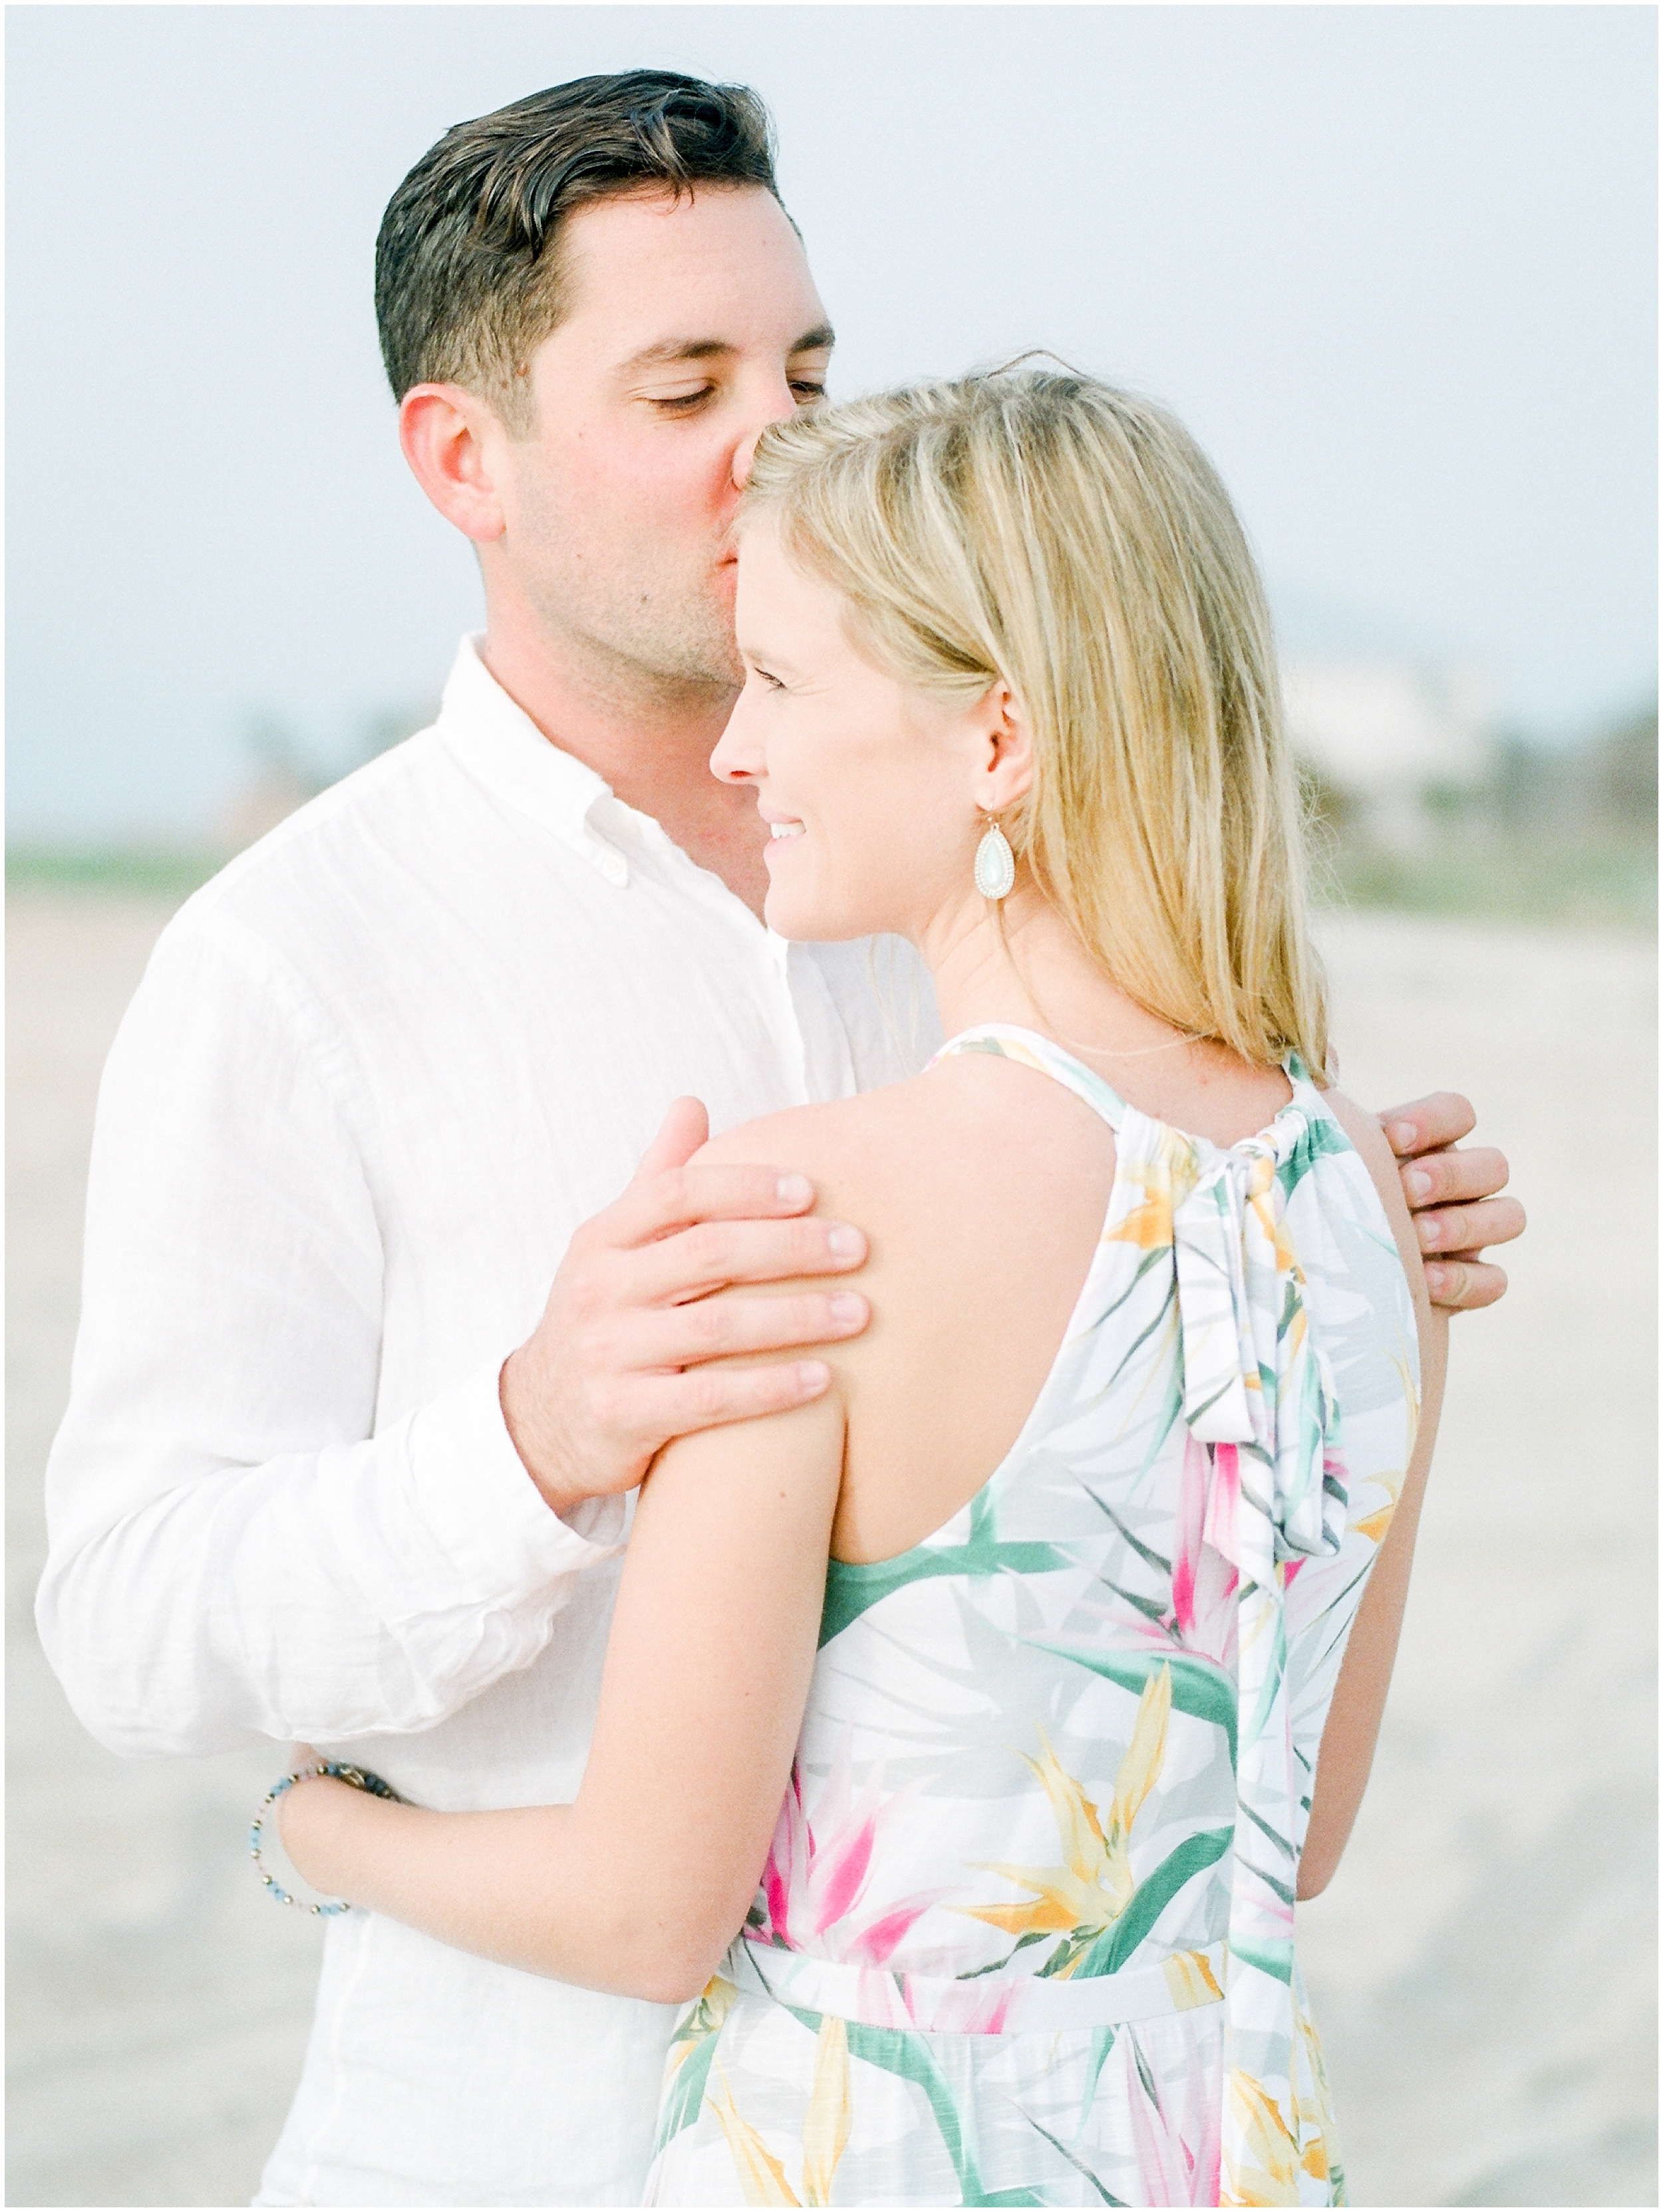 Sunrise Engagement Session at Vilano Beach- Jacksonville, Florida Fine Art Film Wedding Photography_0028.jpg